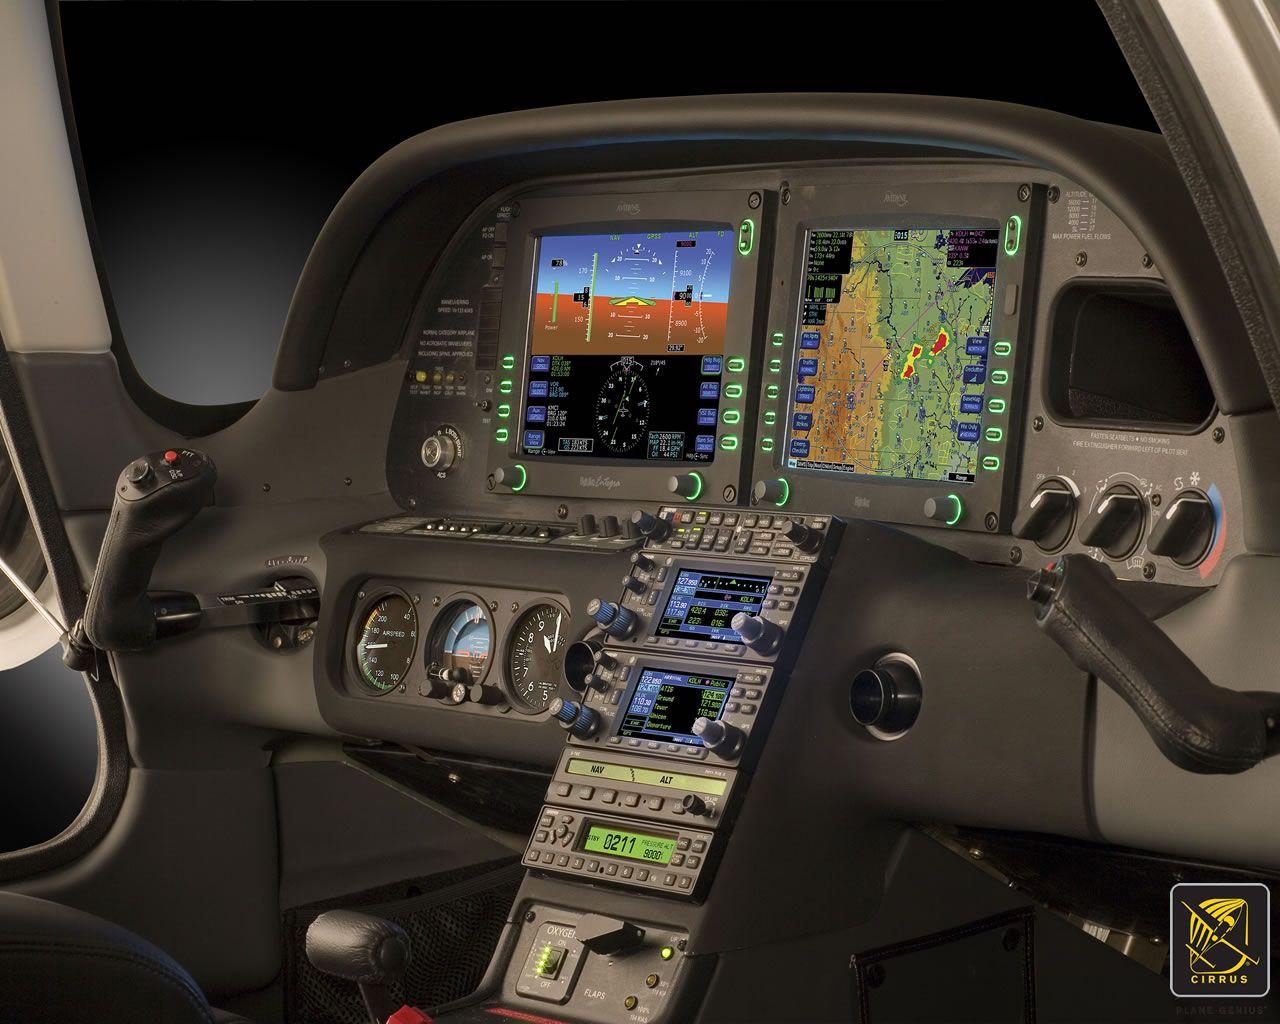 Cirrus Sr 22 Cockpit Aircraft In Our Airpark Pinterest Sr20 Wiring Diagram